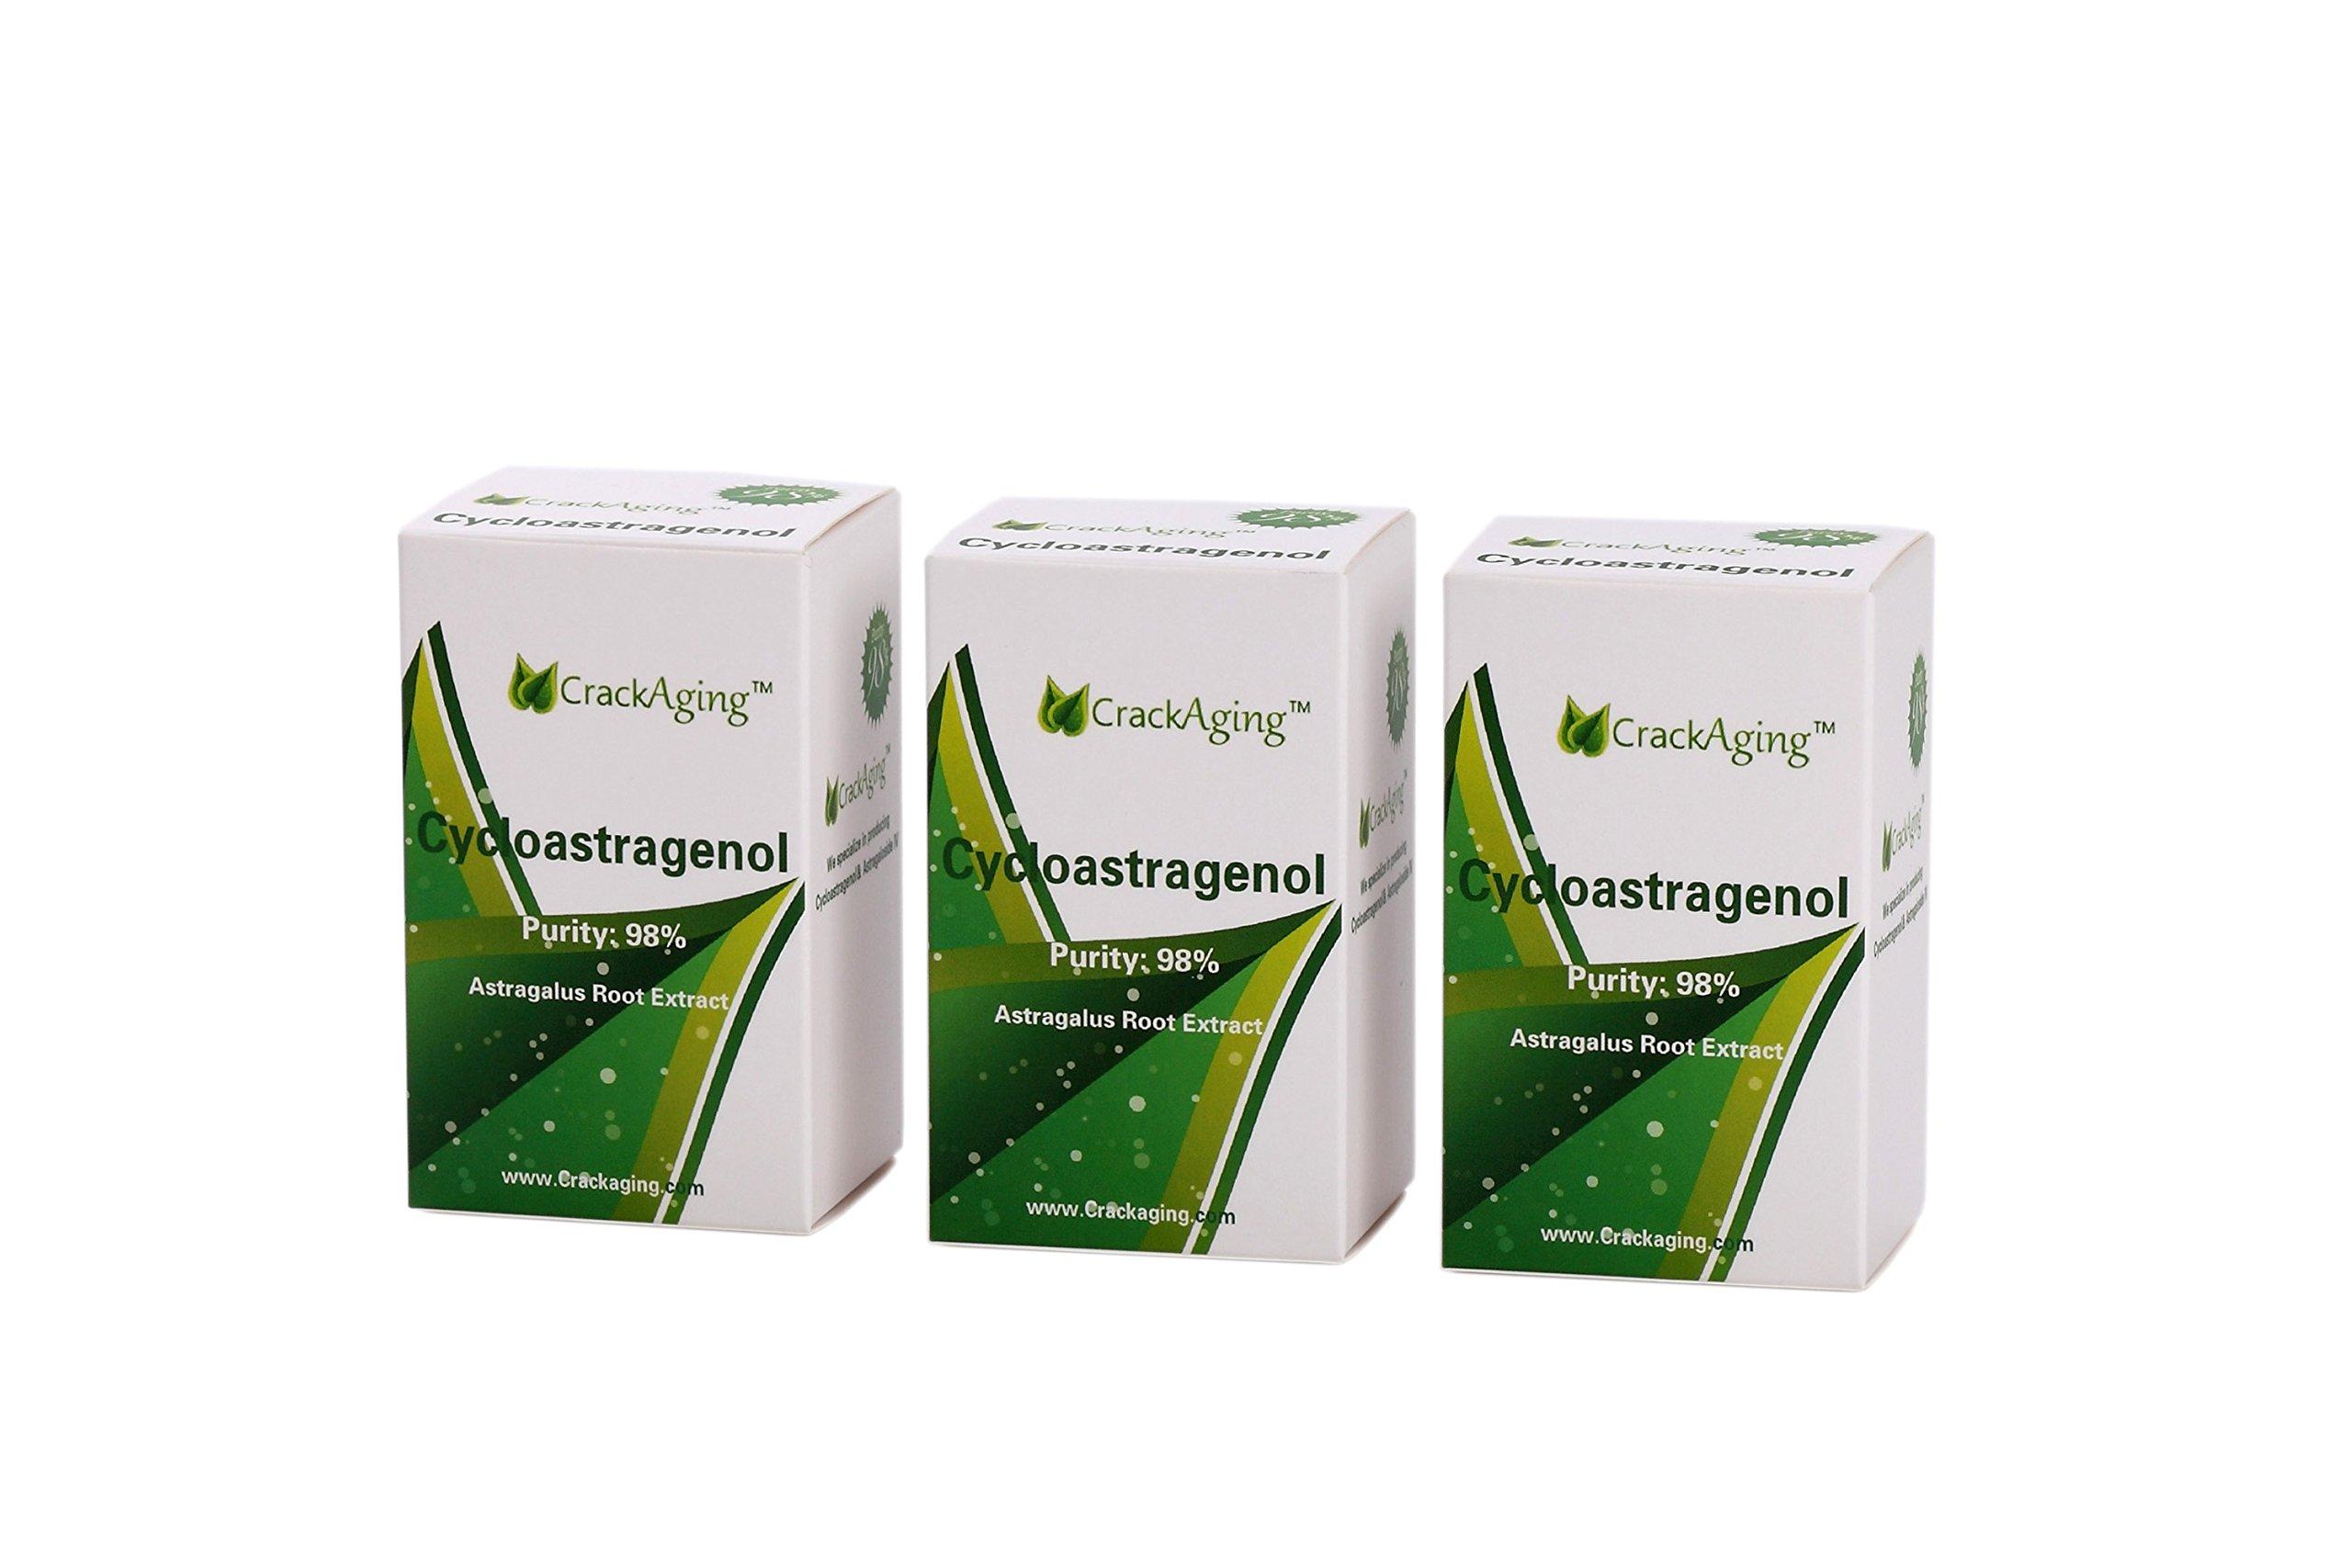 SUPER-ABSORPTION Cycloastragenol 98% (10mg/cap, 180 Caps in 3 Bottles)